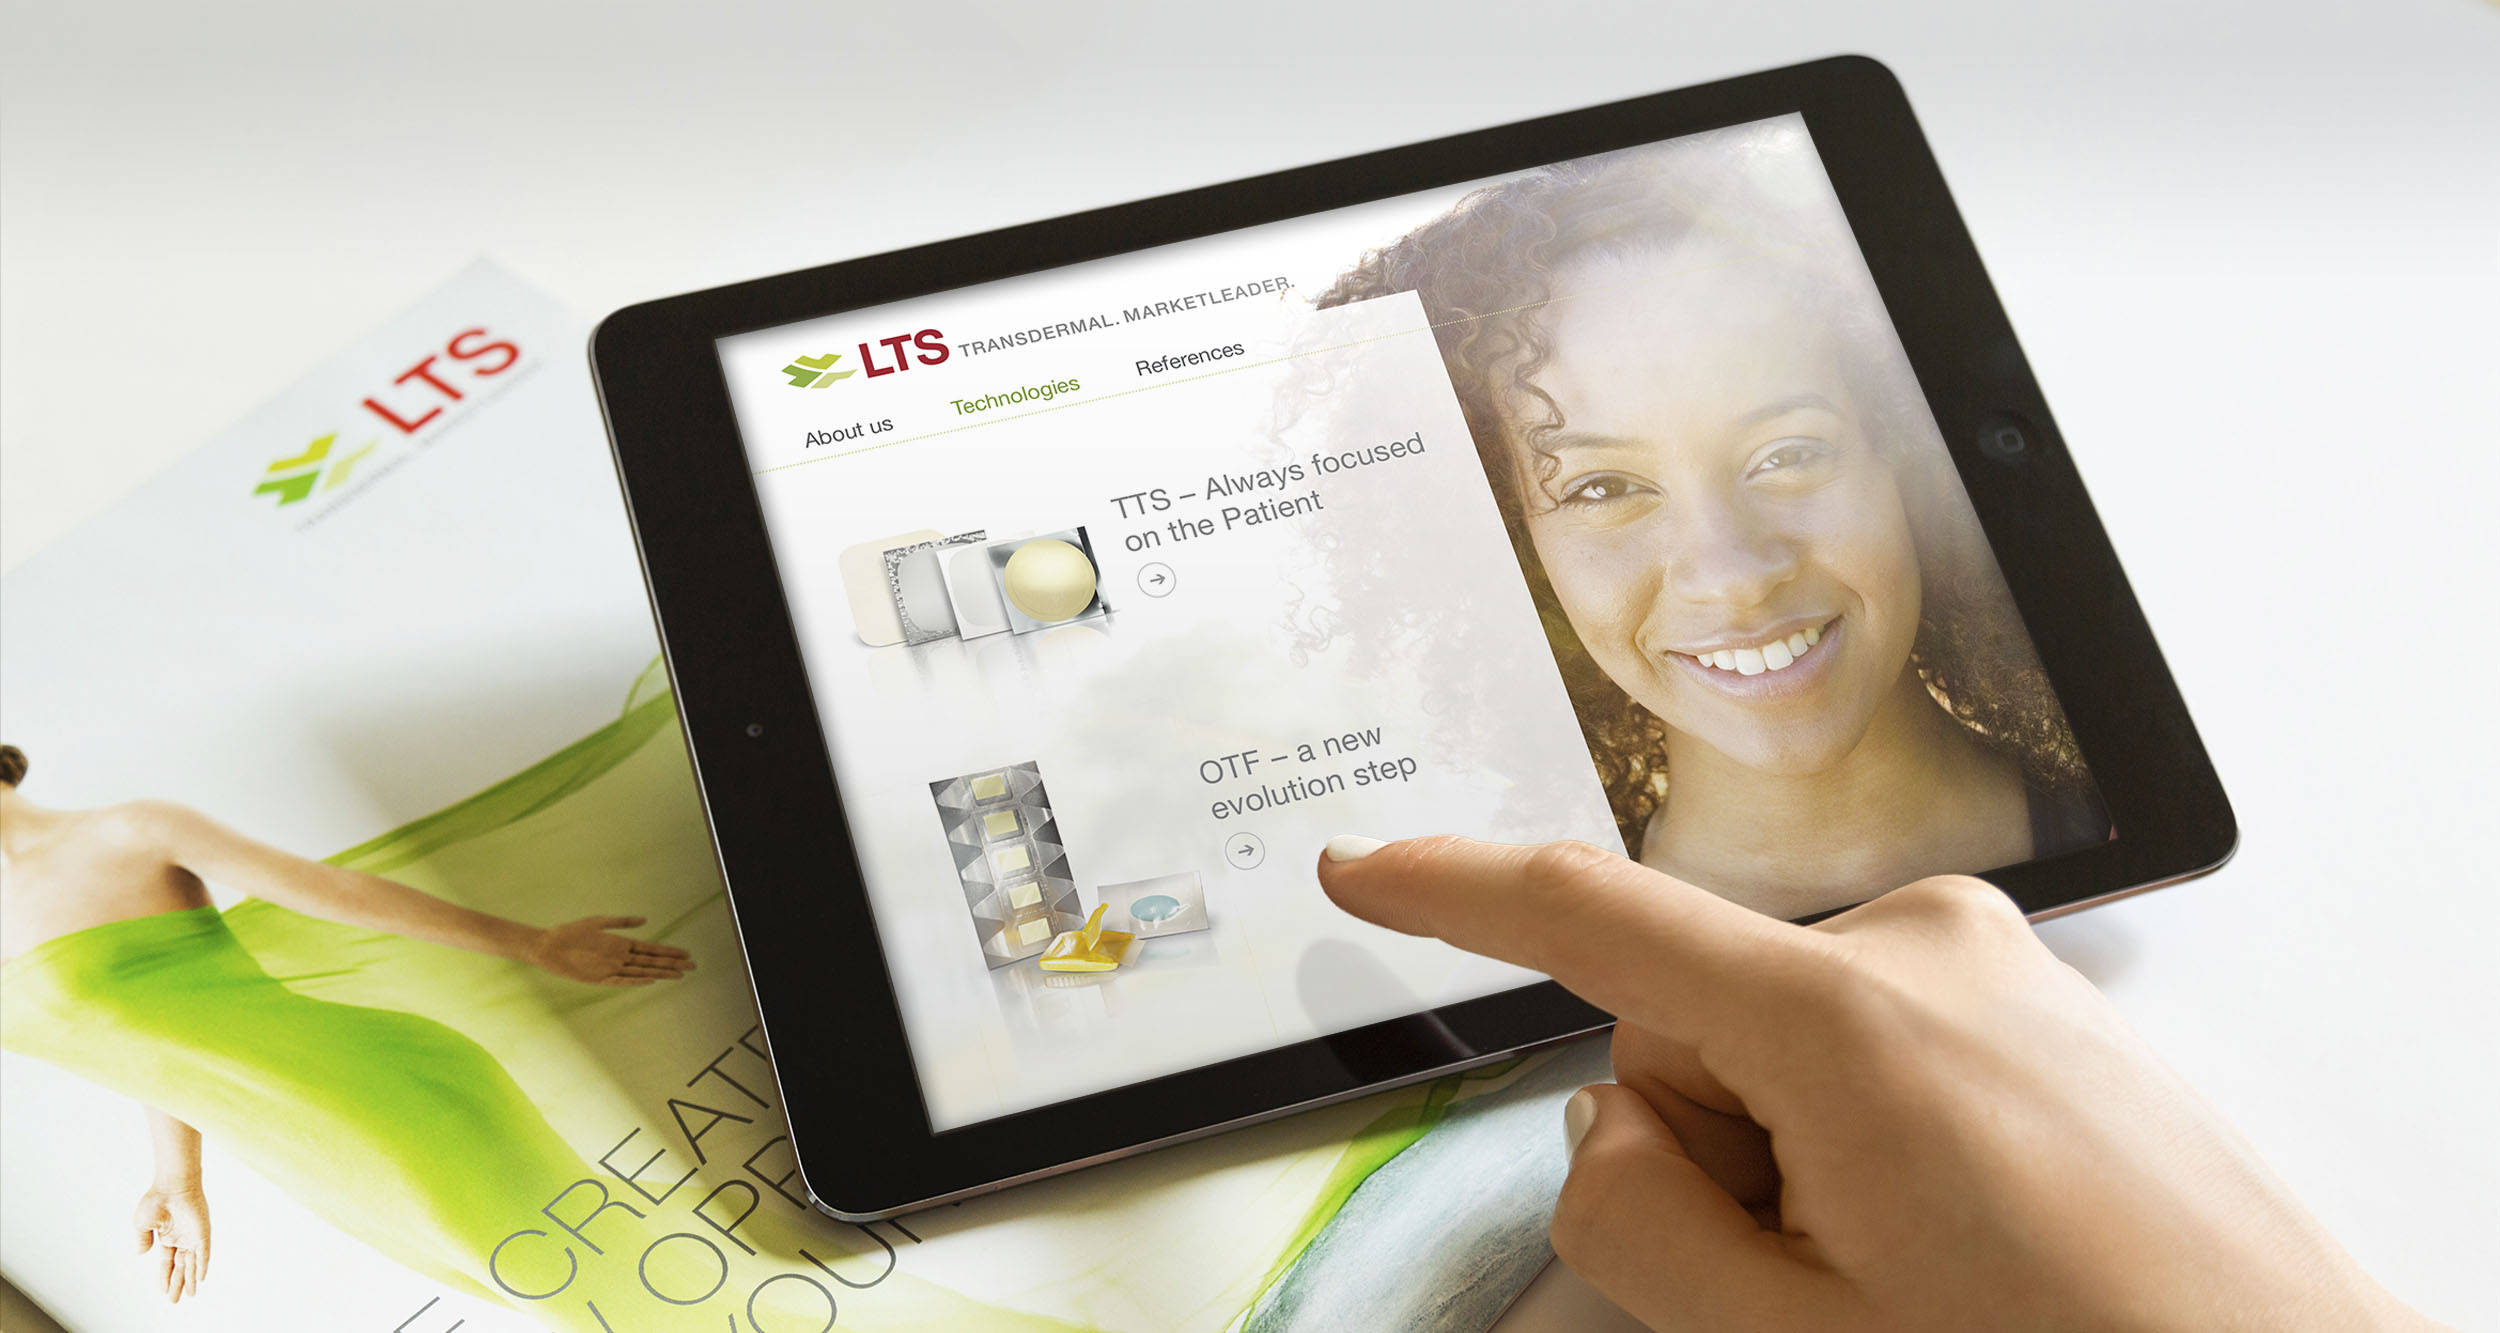 5 – LTS – digitale Produkpraesentation